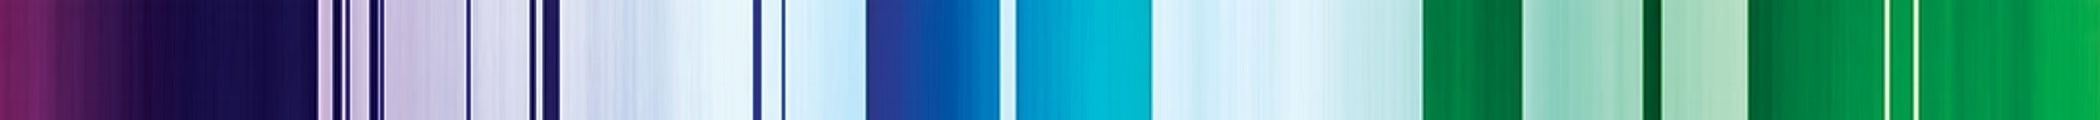 color bar thin.jpg